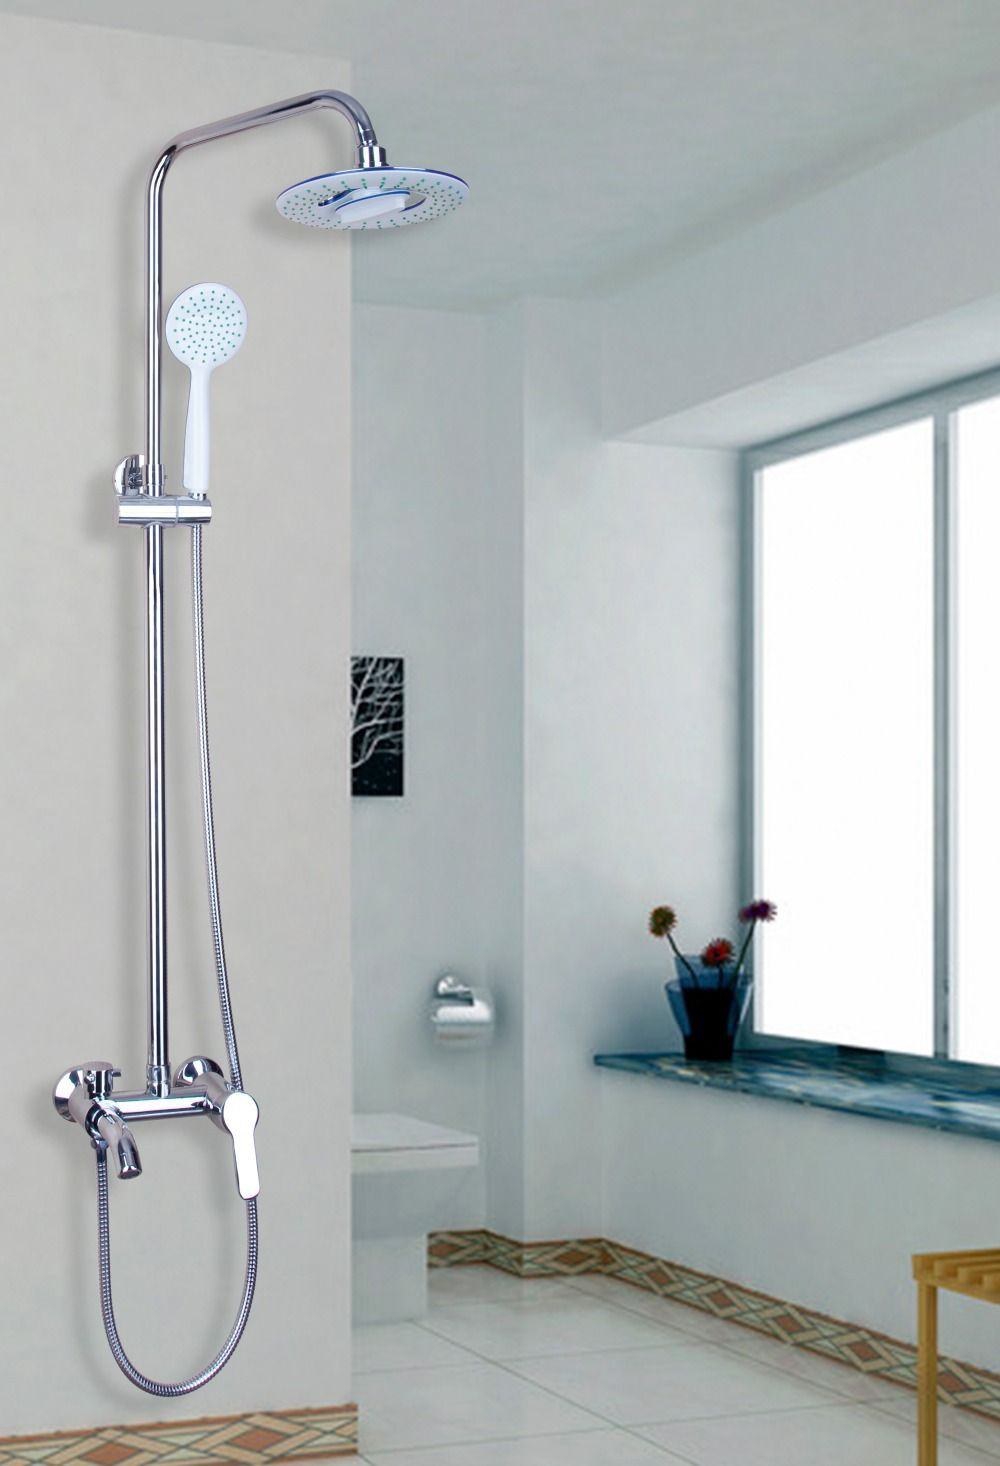 Over-Head Waterfall Rainfall Wall Mounted Bathroom LED Roman Tub ...